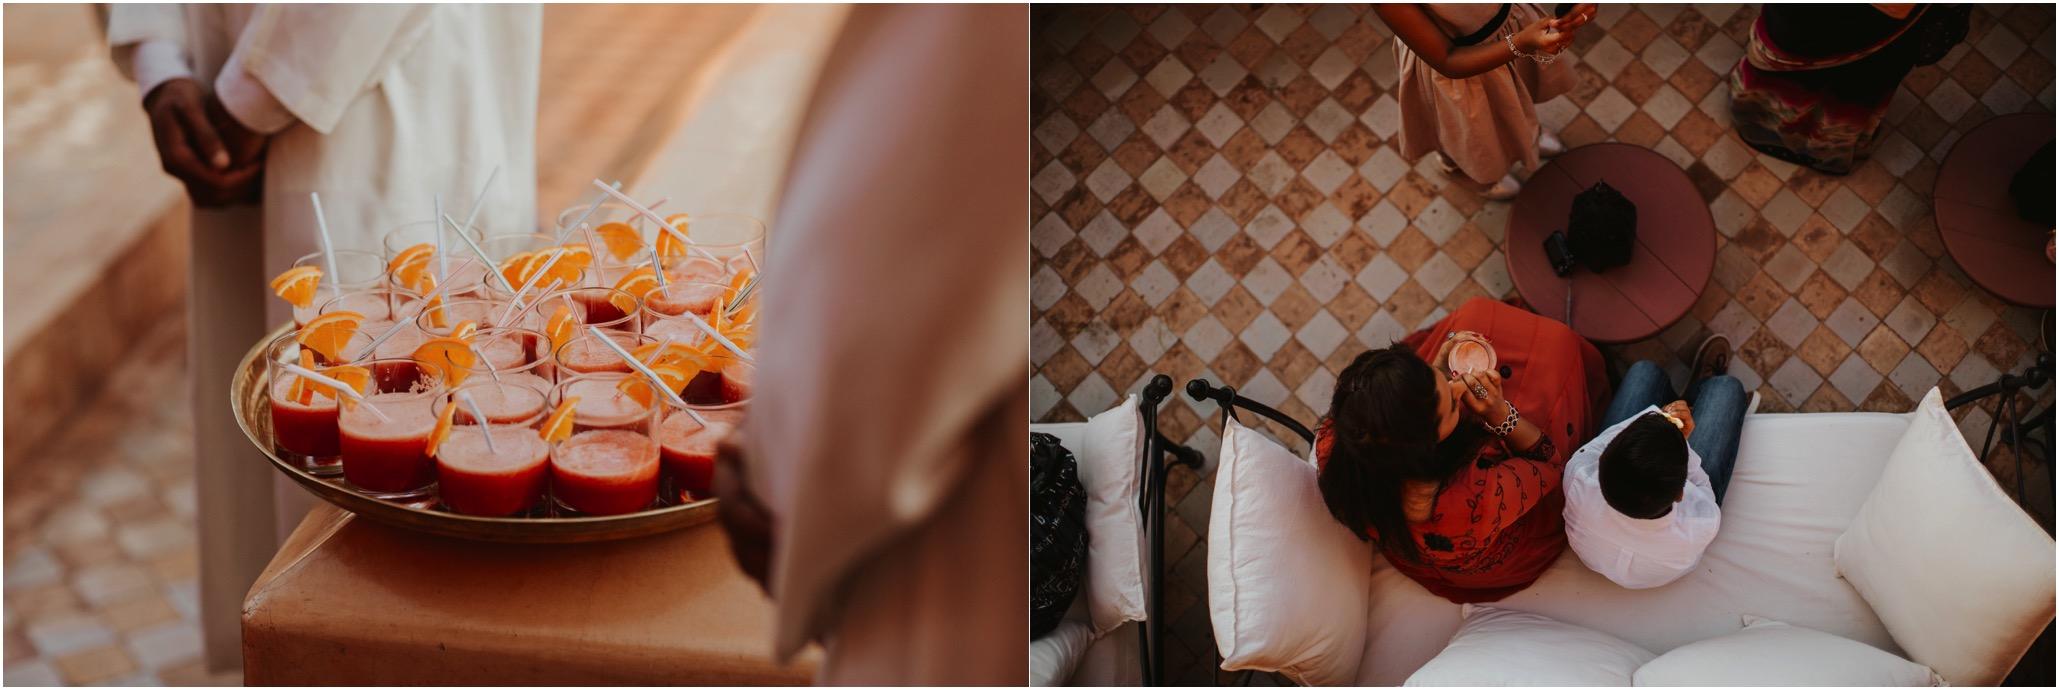 Morocco Wedding0013.jpg